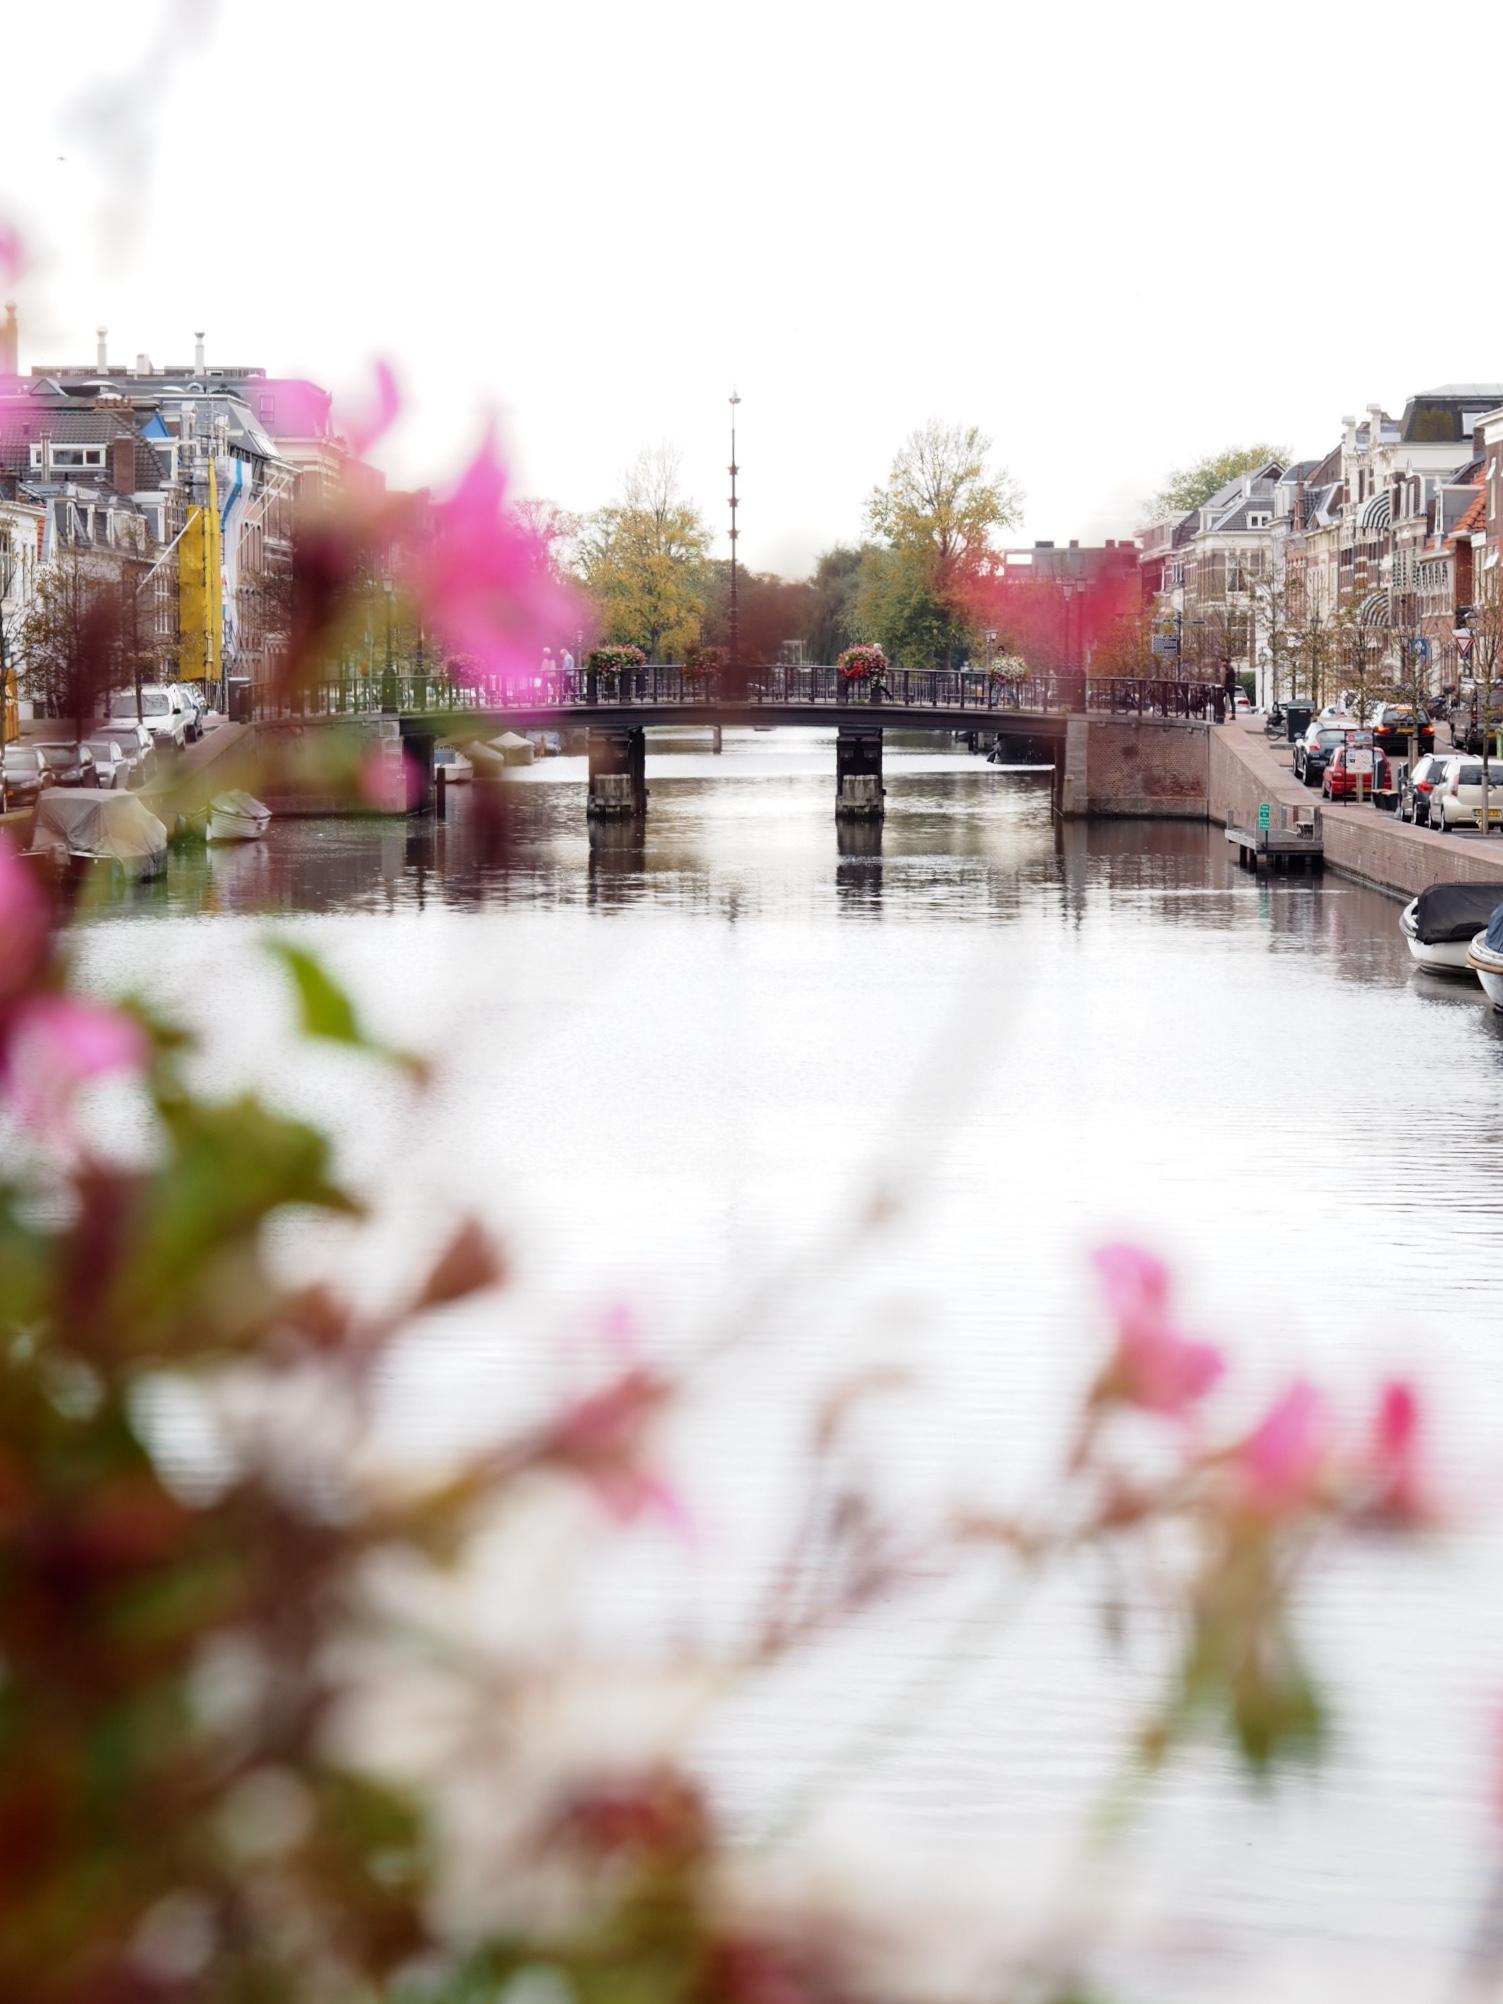 Bruggetjes en monumentale panden langs de gracht in Haarlem